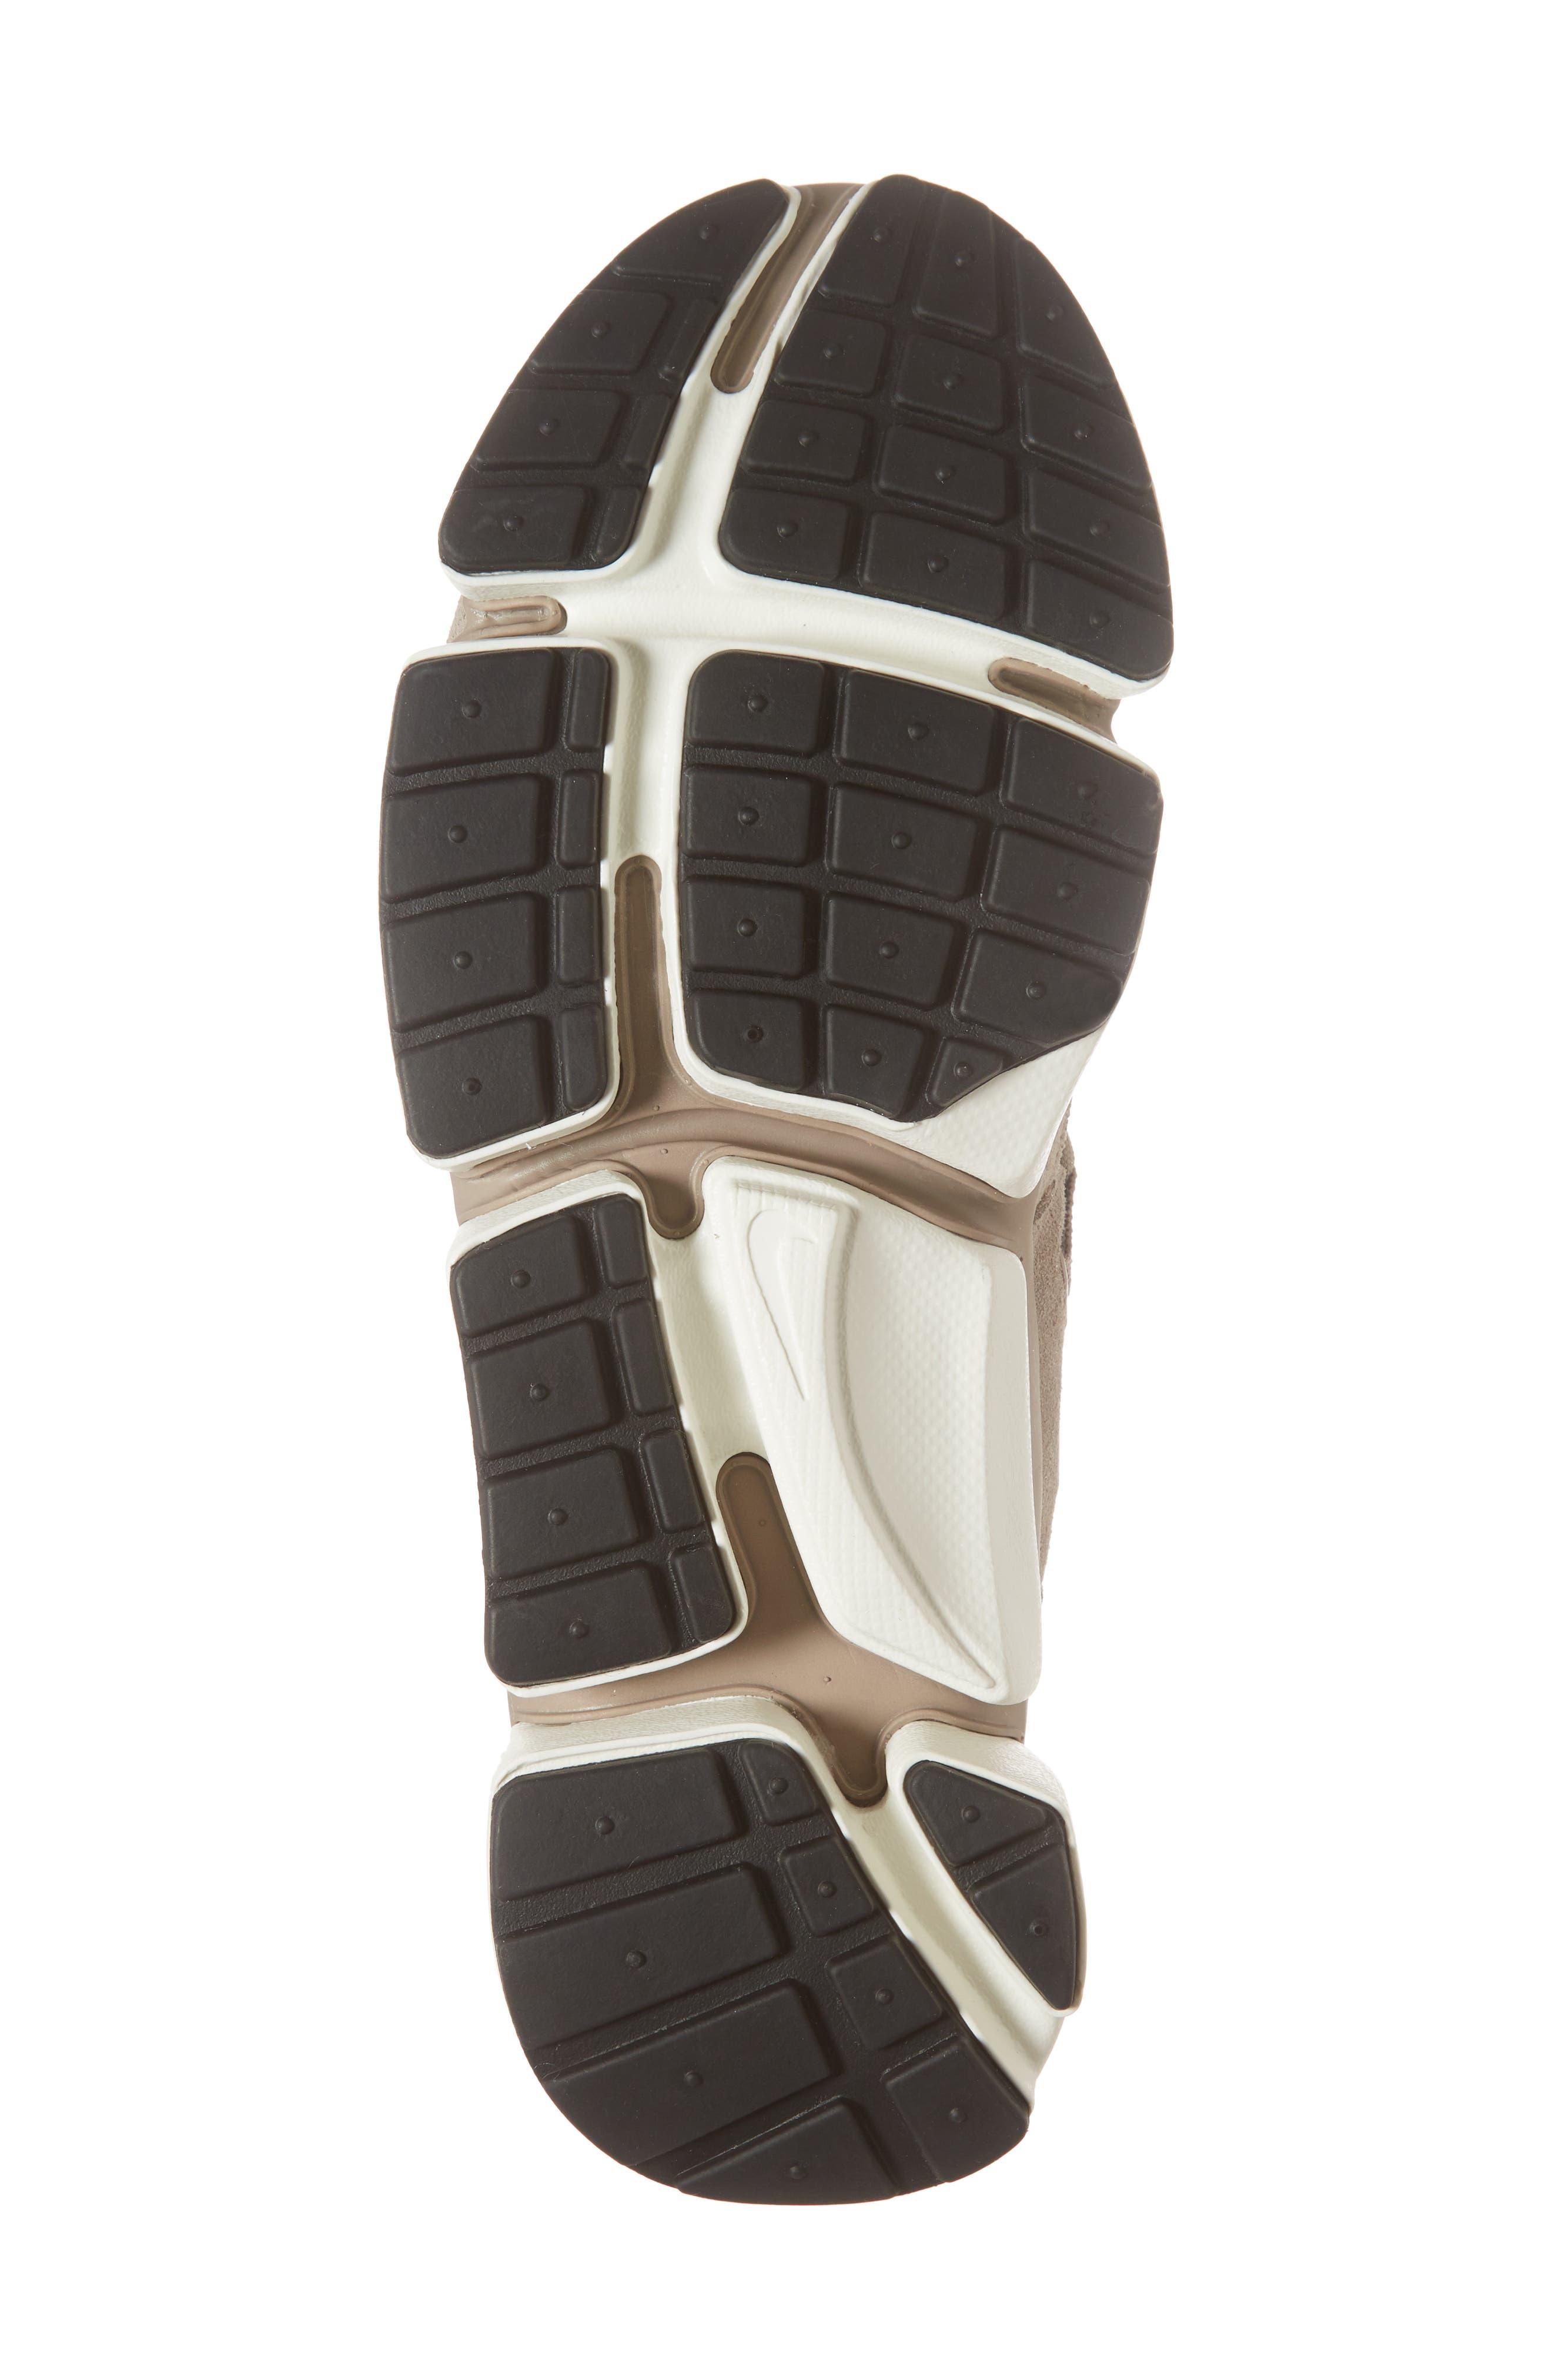 PocketKnife DM SE Sneaker,                             Alternate thumbnail 6, color,                             Sepia Stone/ Sail/ Black